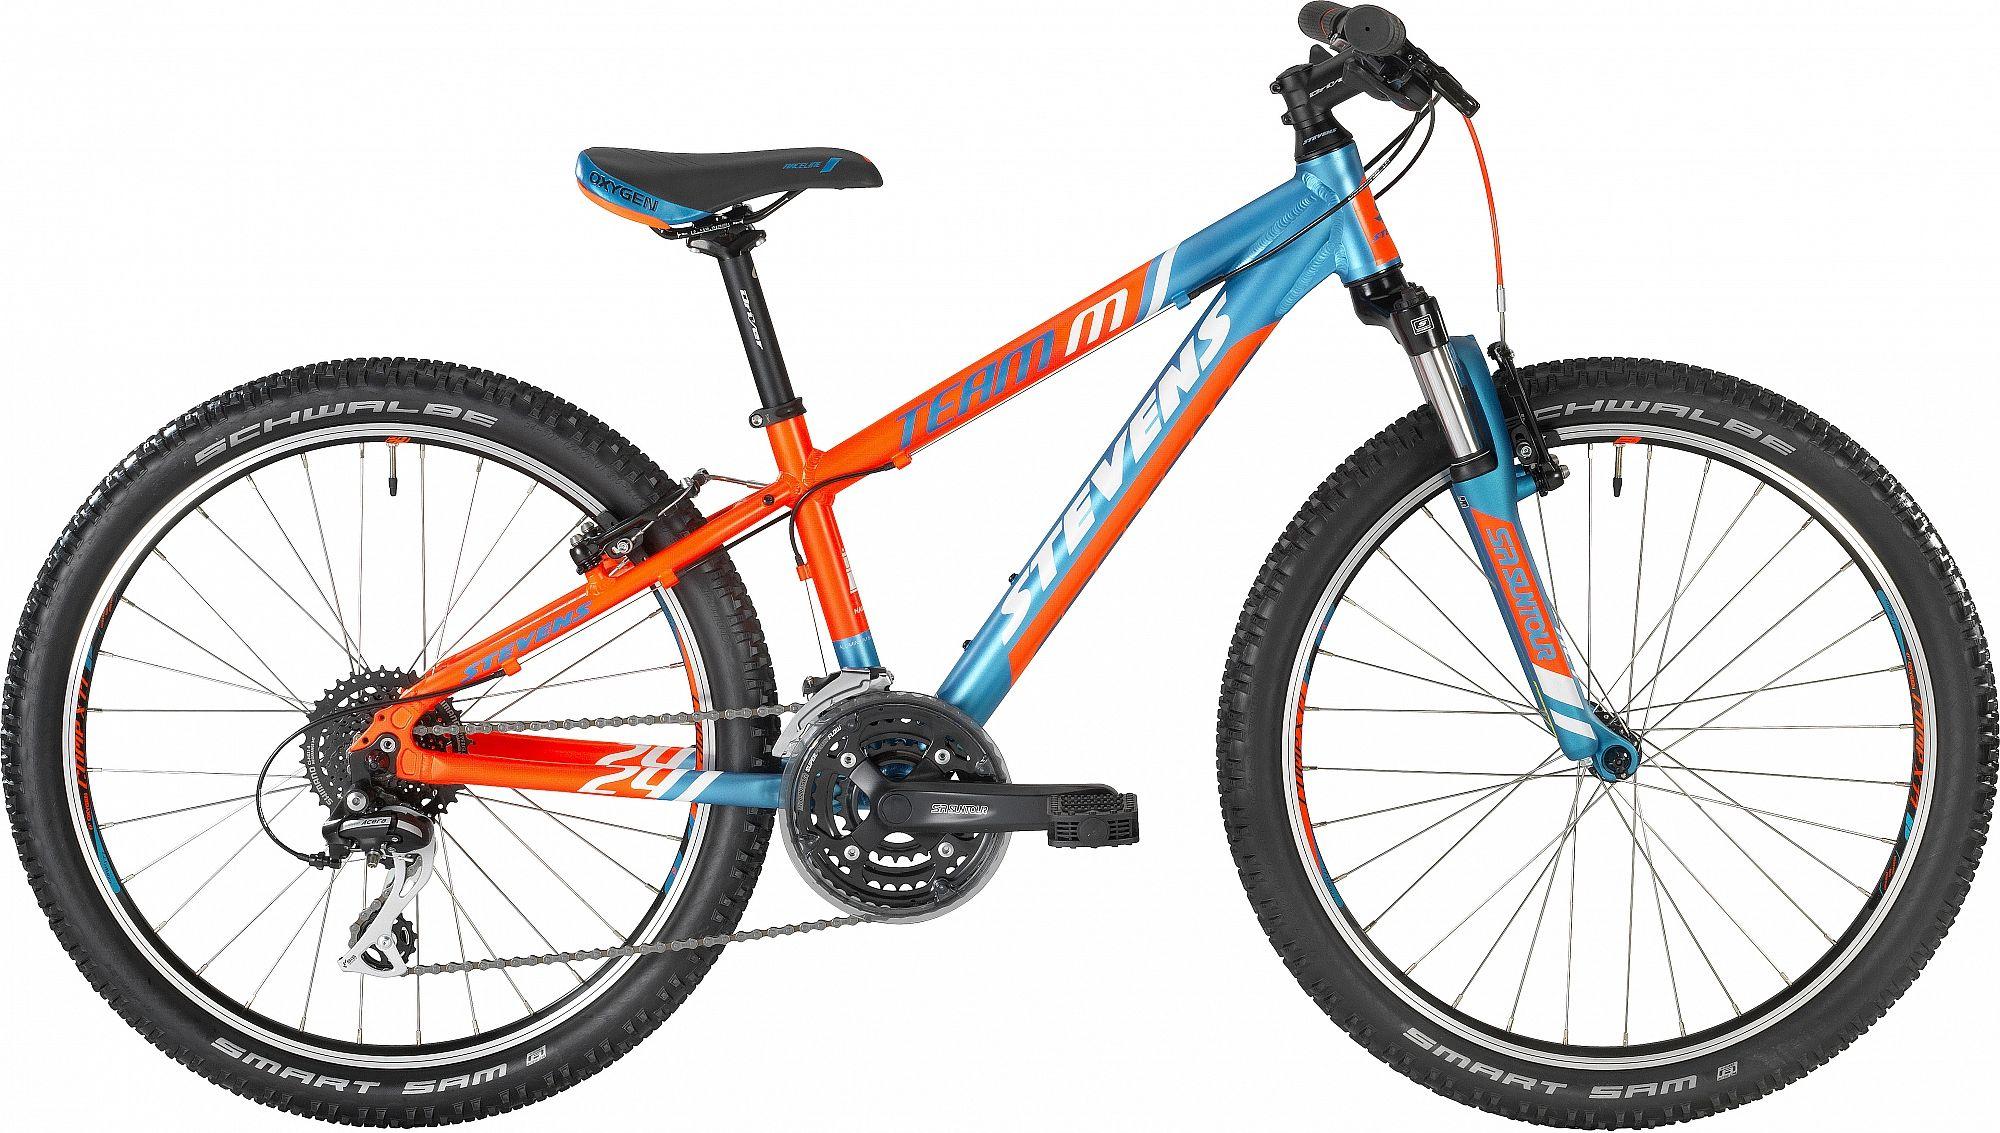 stevens 2018 team m 24 neon oran ov junior stevens bikes. Black Bedroom Furniture Sets. Home Design Ideas